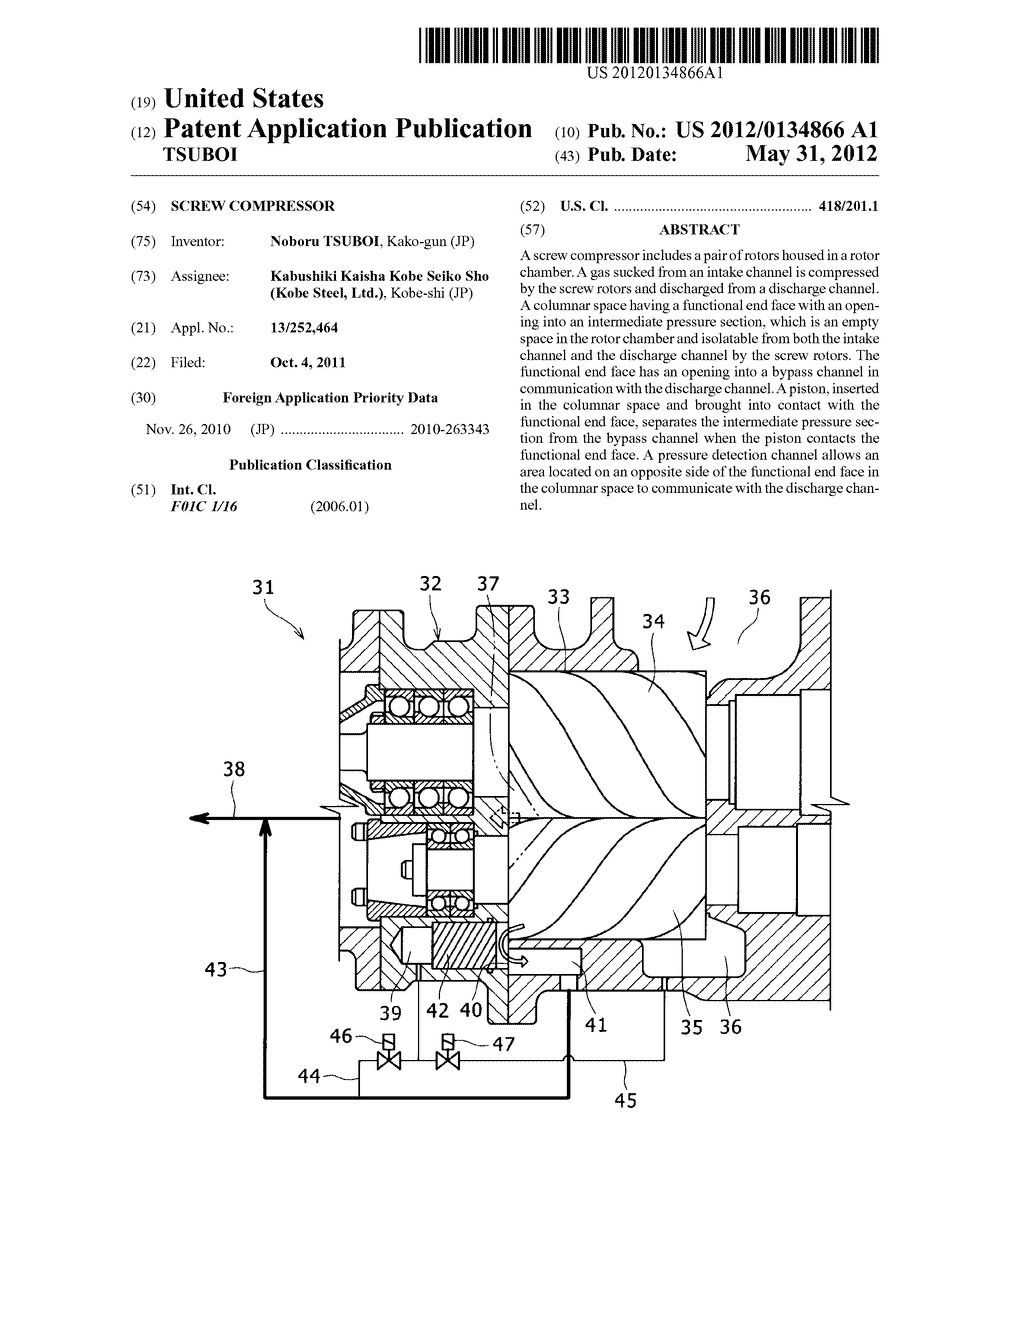 SCREW COMPRESSOR - diagram, schematic, and image 01Patents